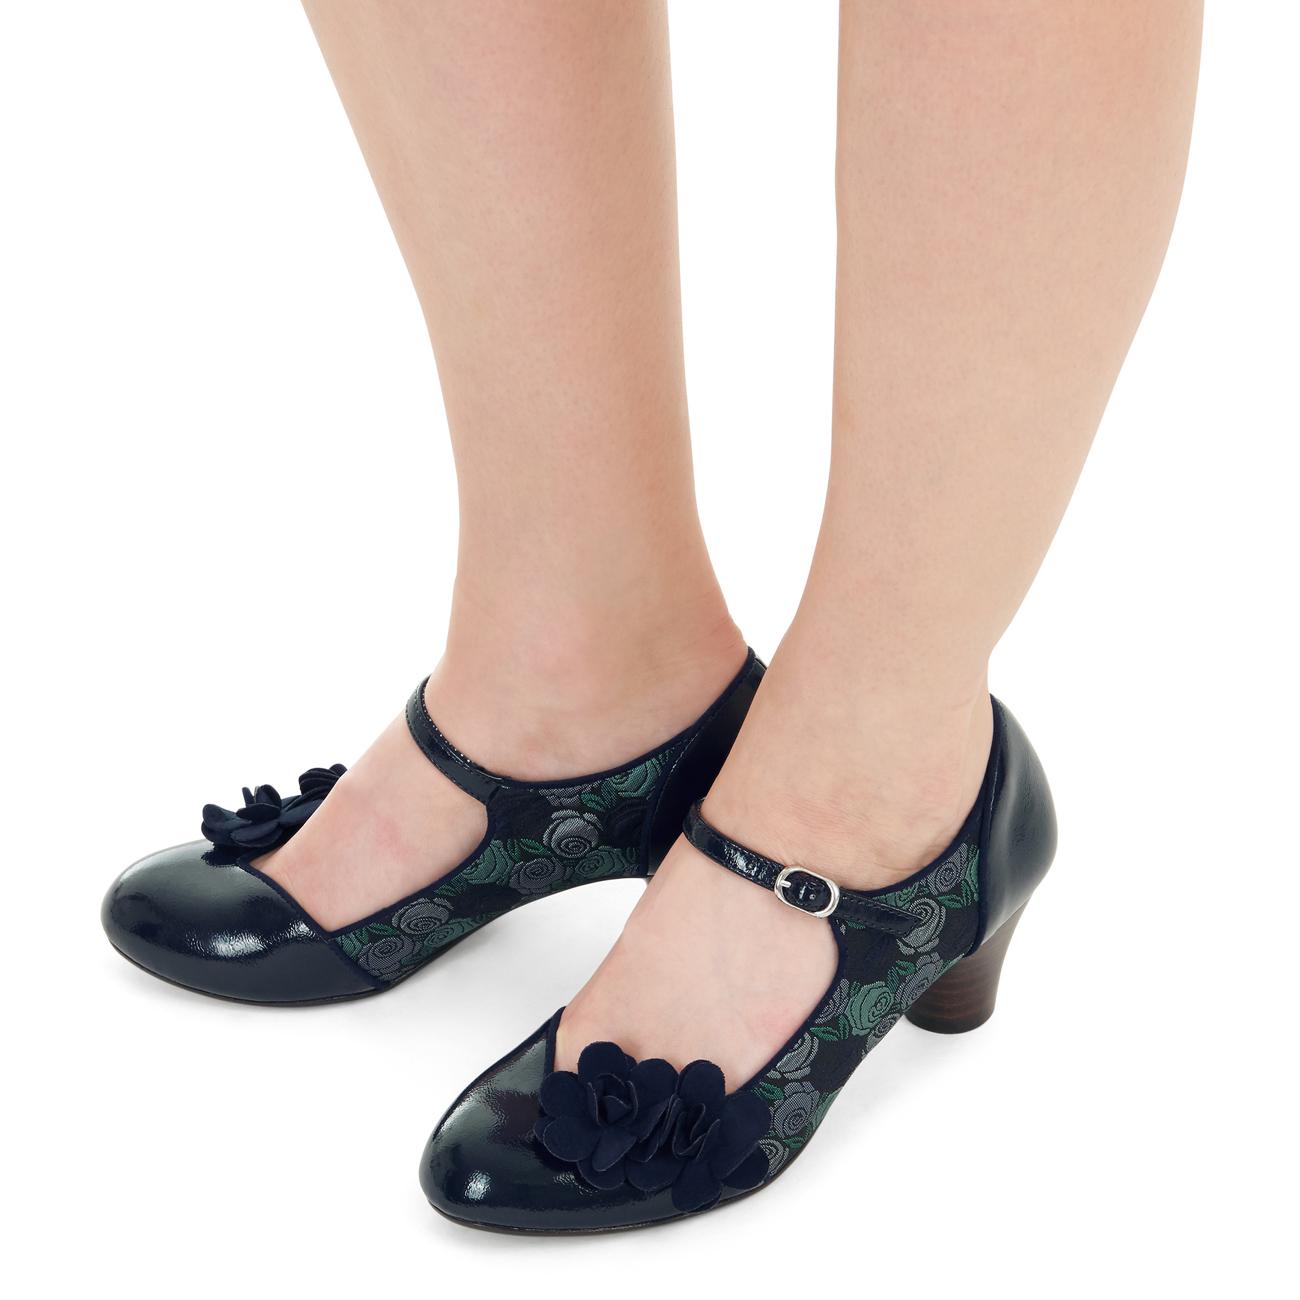 Ruby Shoo Freya Mid Heel Mary Jane Corsage Pumps 3-9 36-42 Black Blue